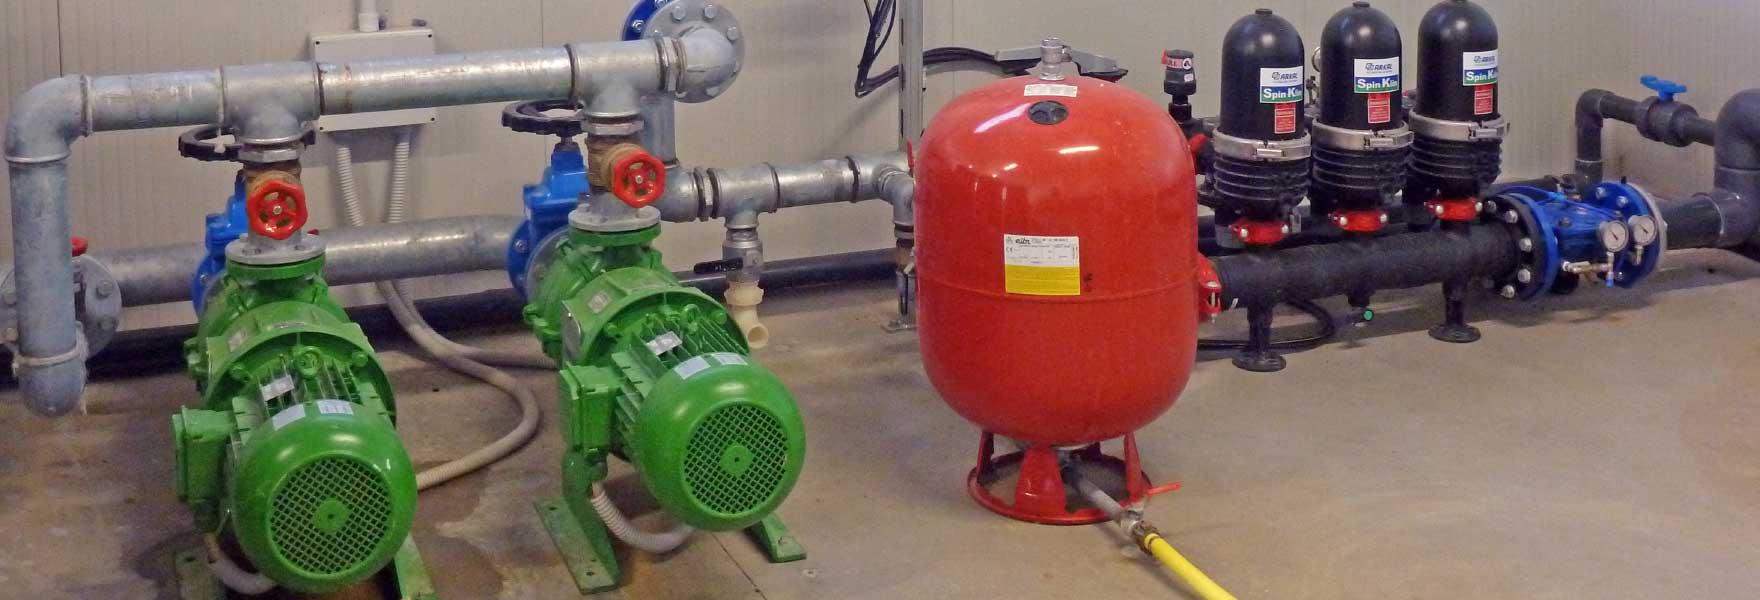 01.5 pompe irrigazione veneta